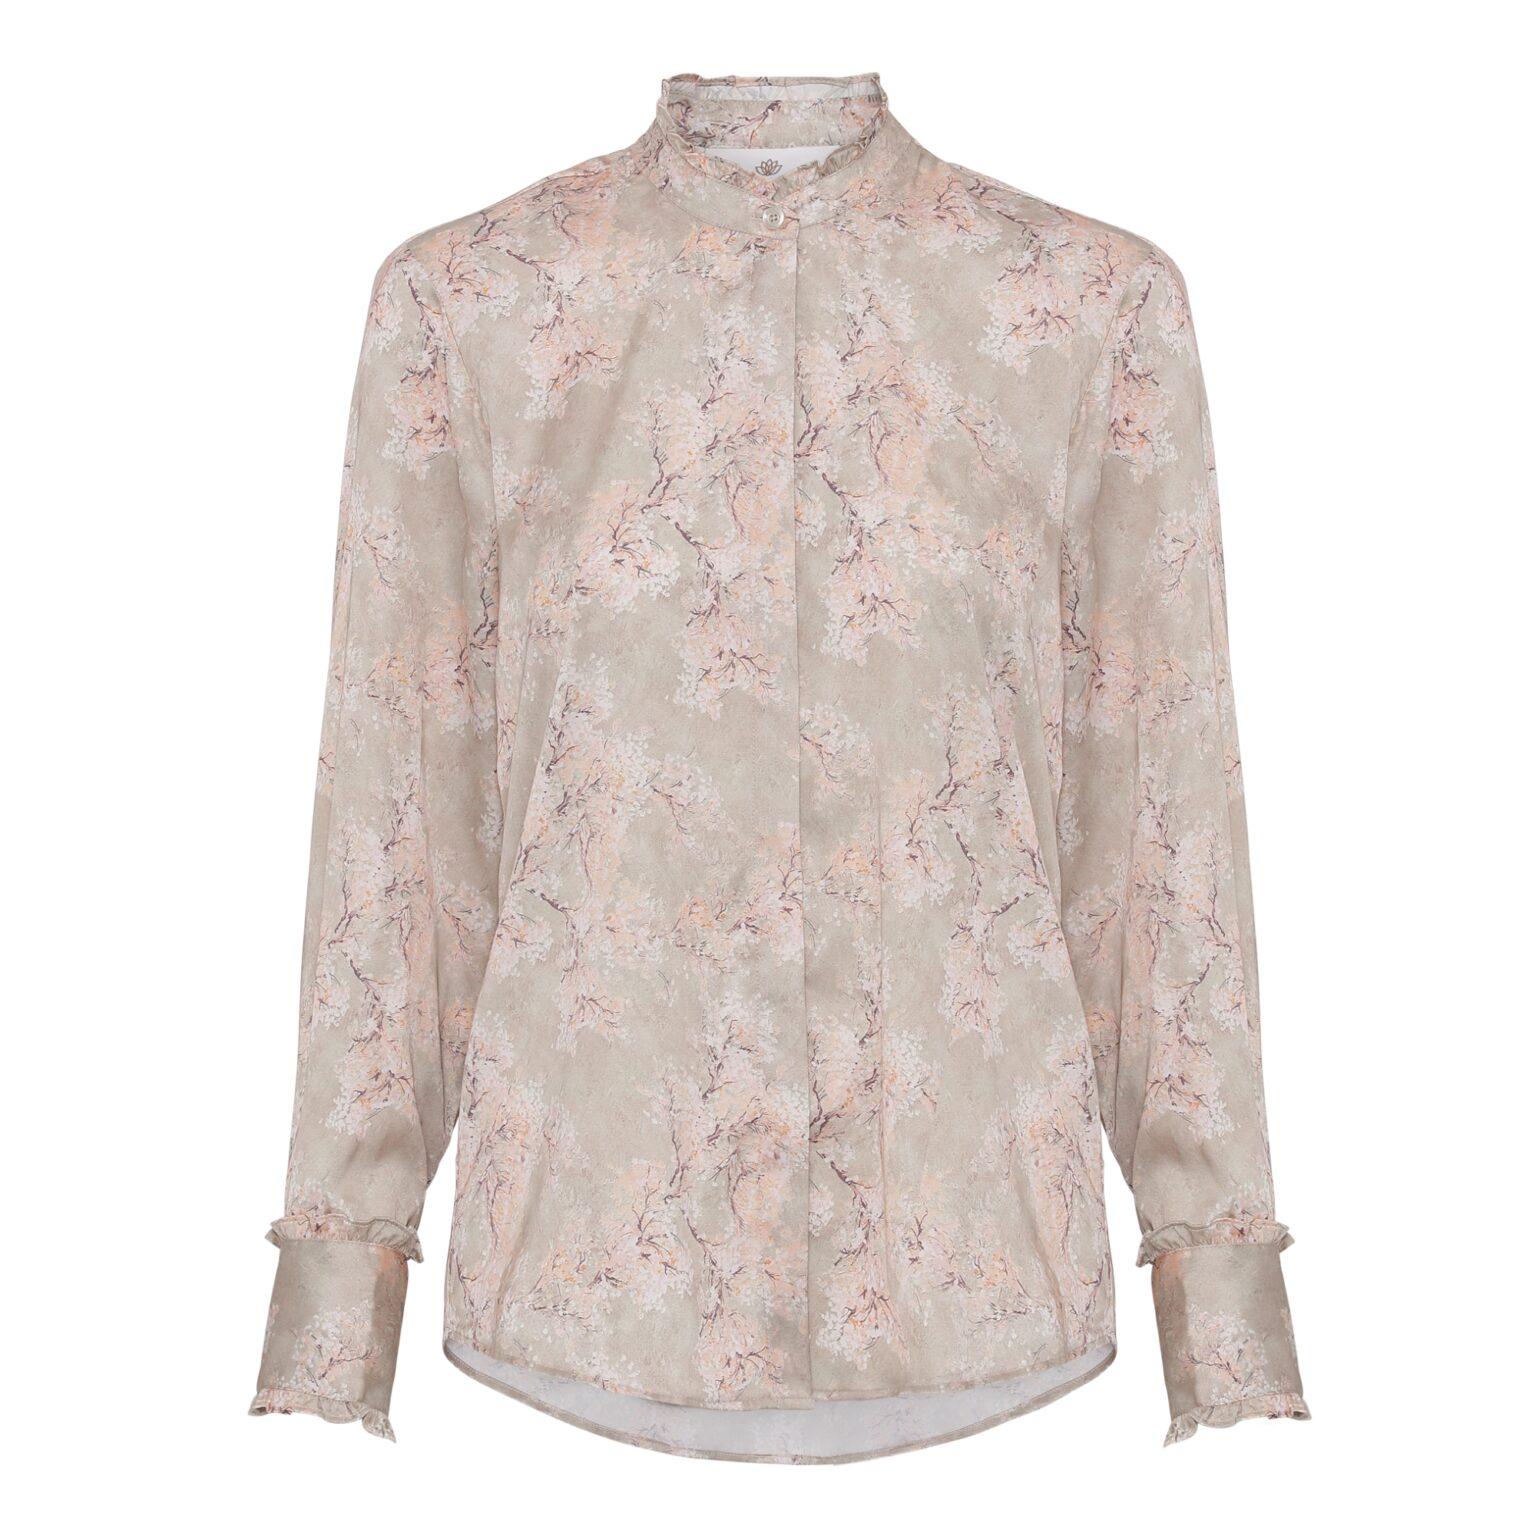 Karmamia Edith Shirt Cherry Blossom